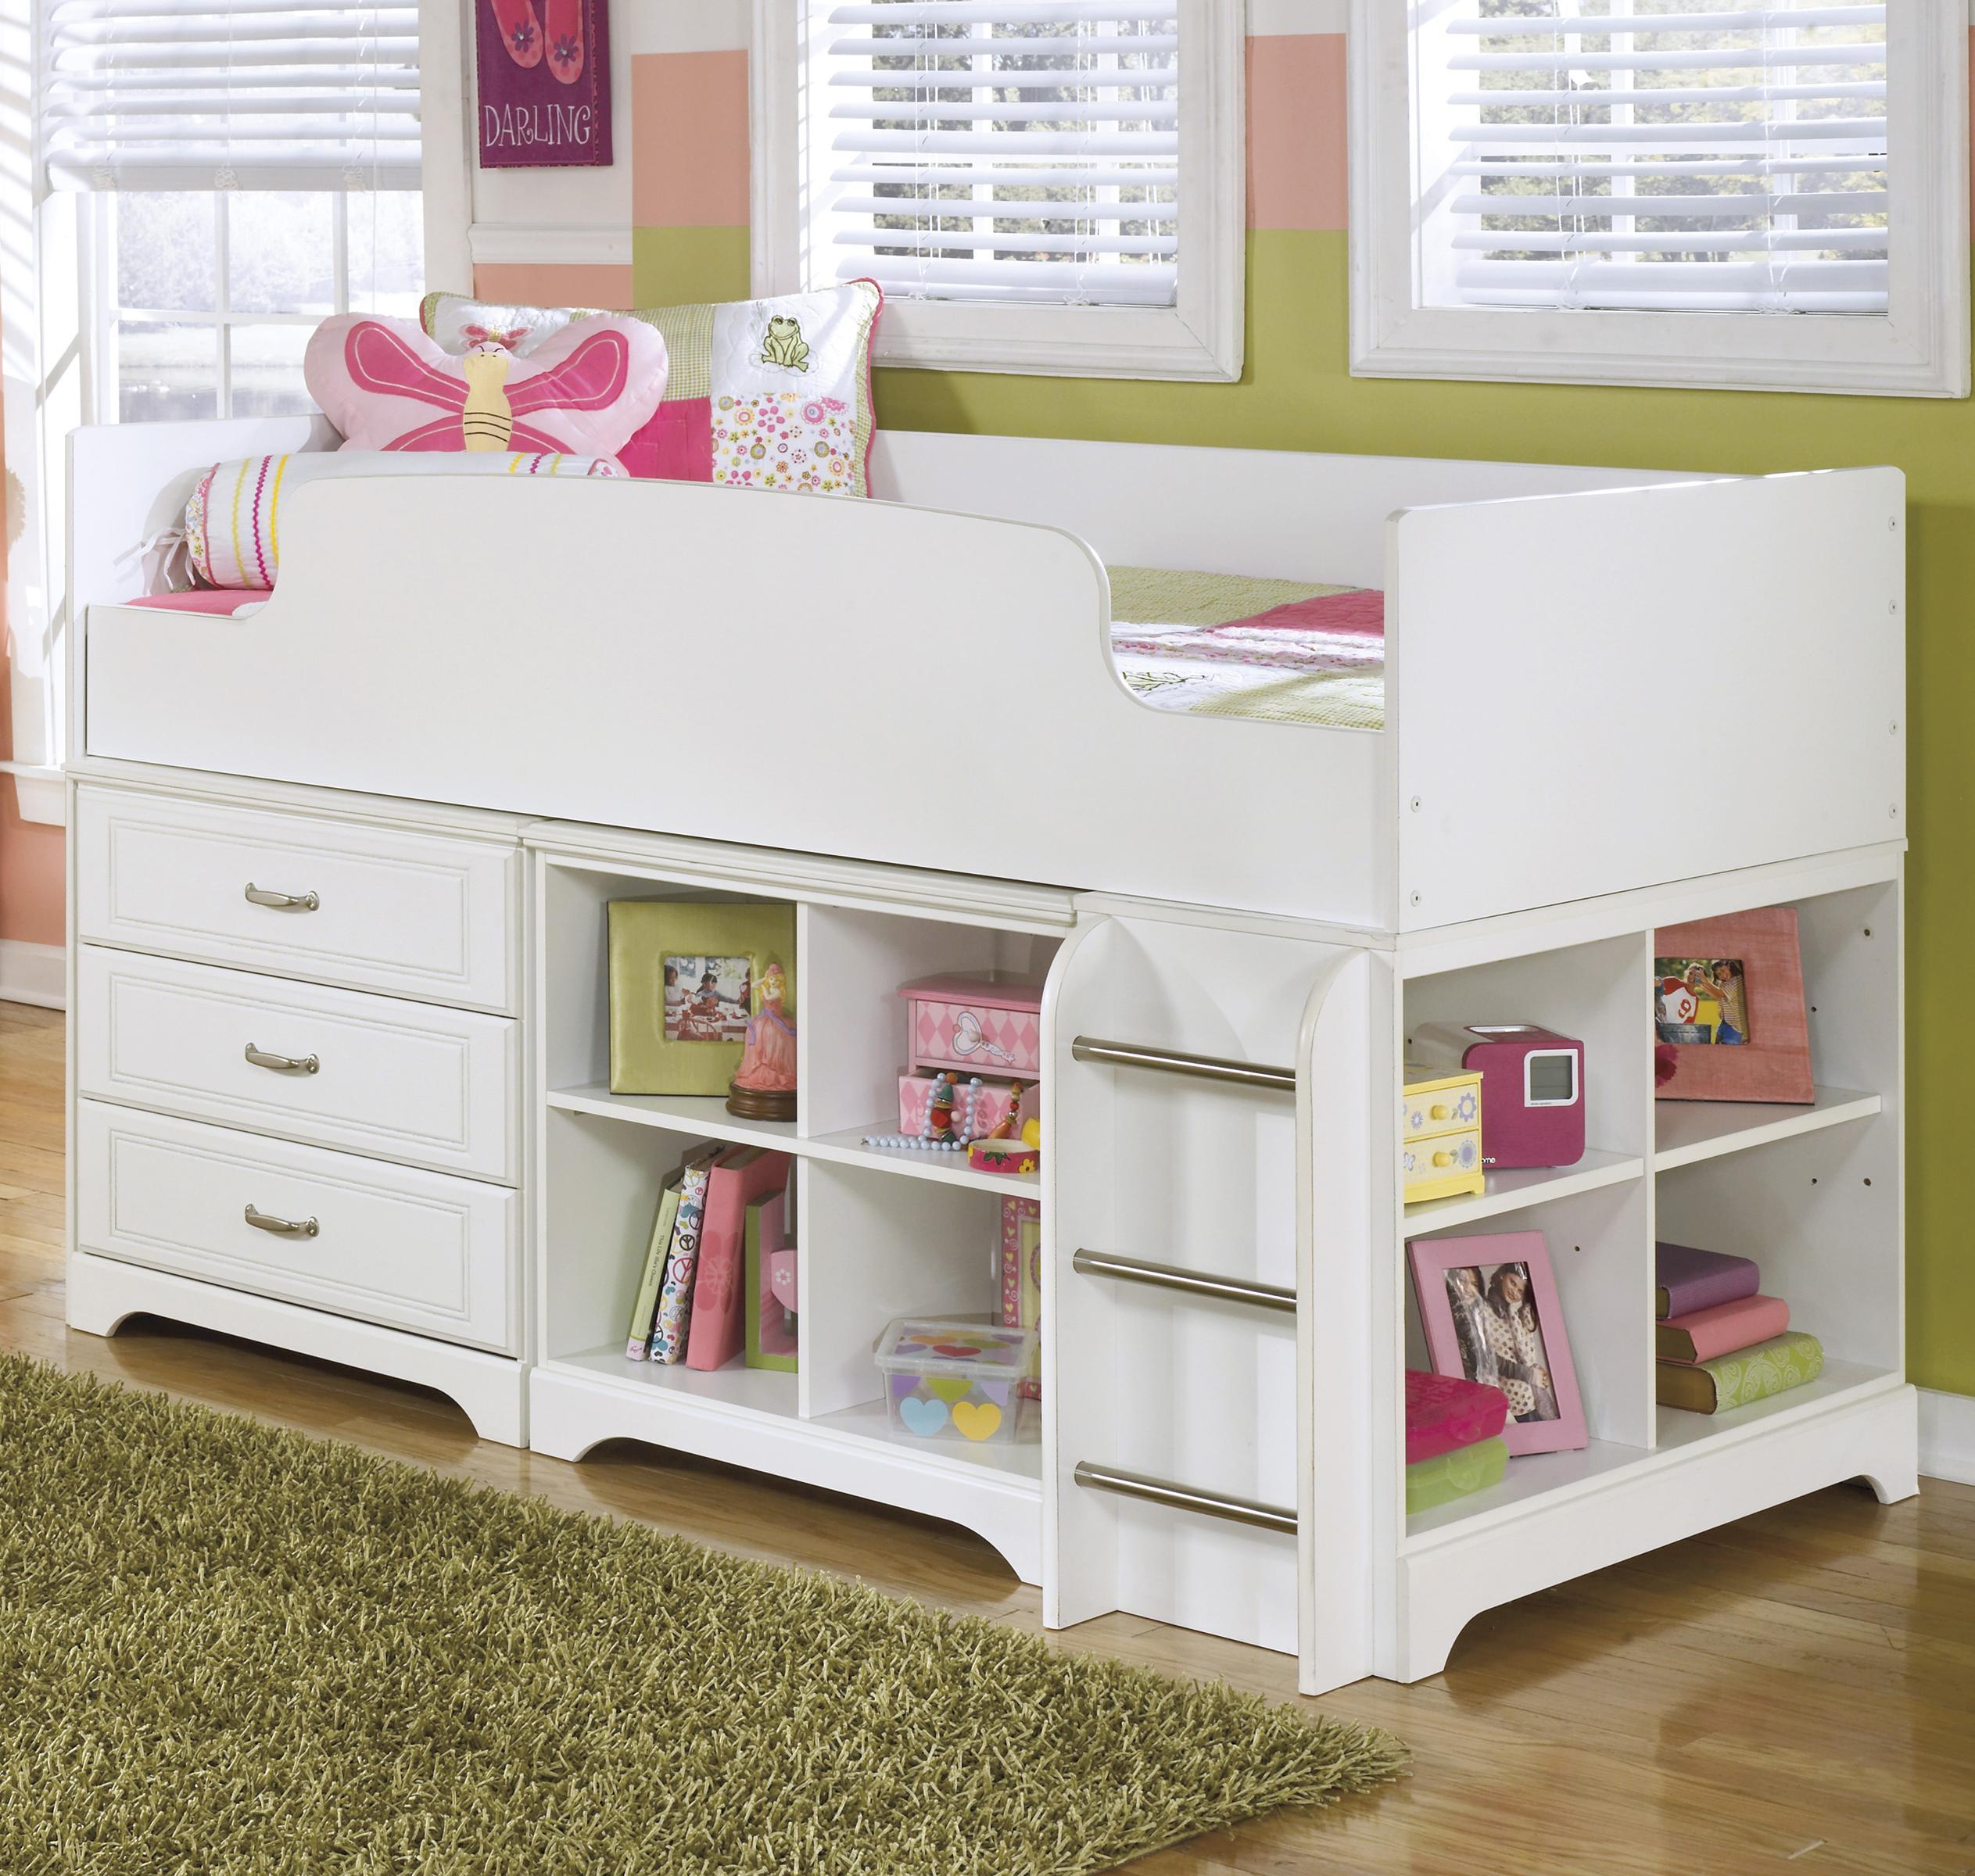 Lulu Twin Loft Bed w/ Loft Drawer & Bin Storage by Signature Design by Ashley at Value City Furniture